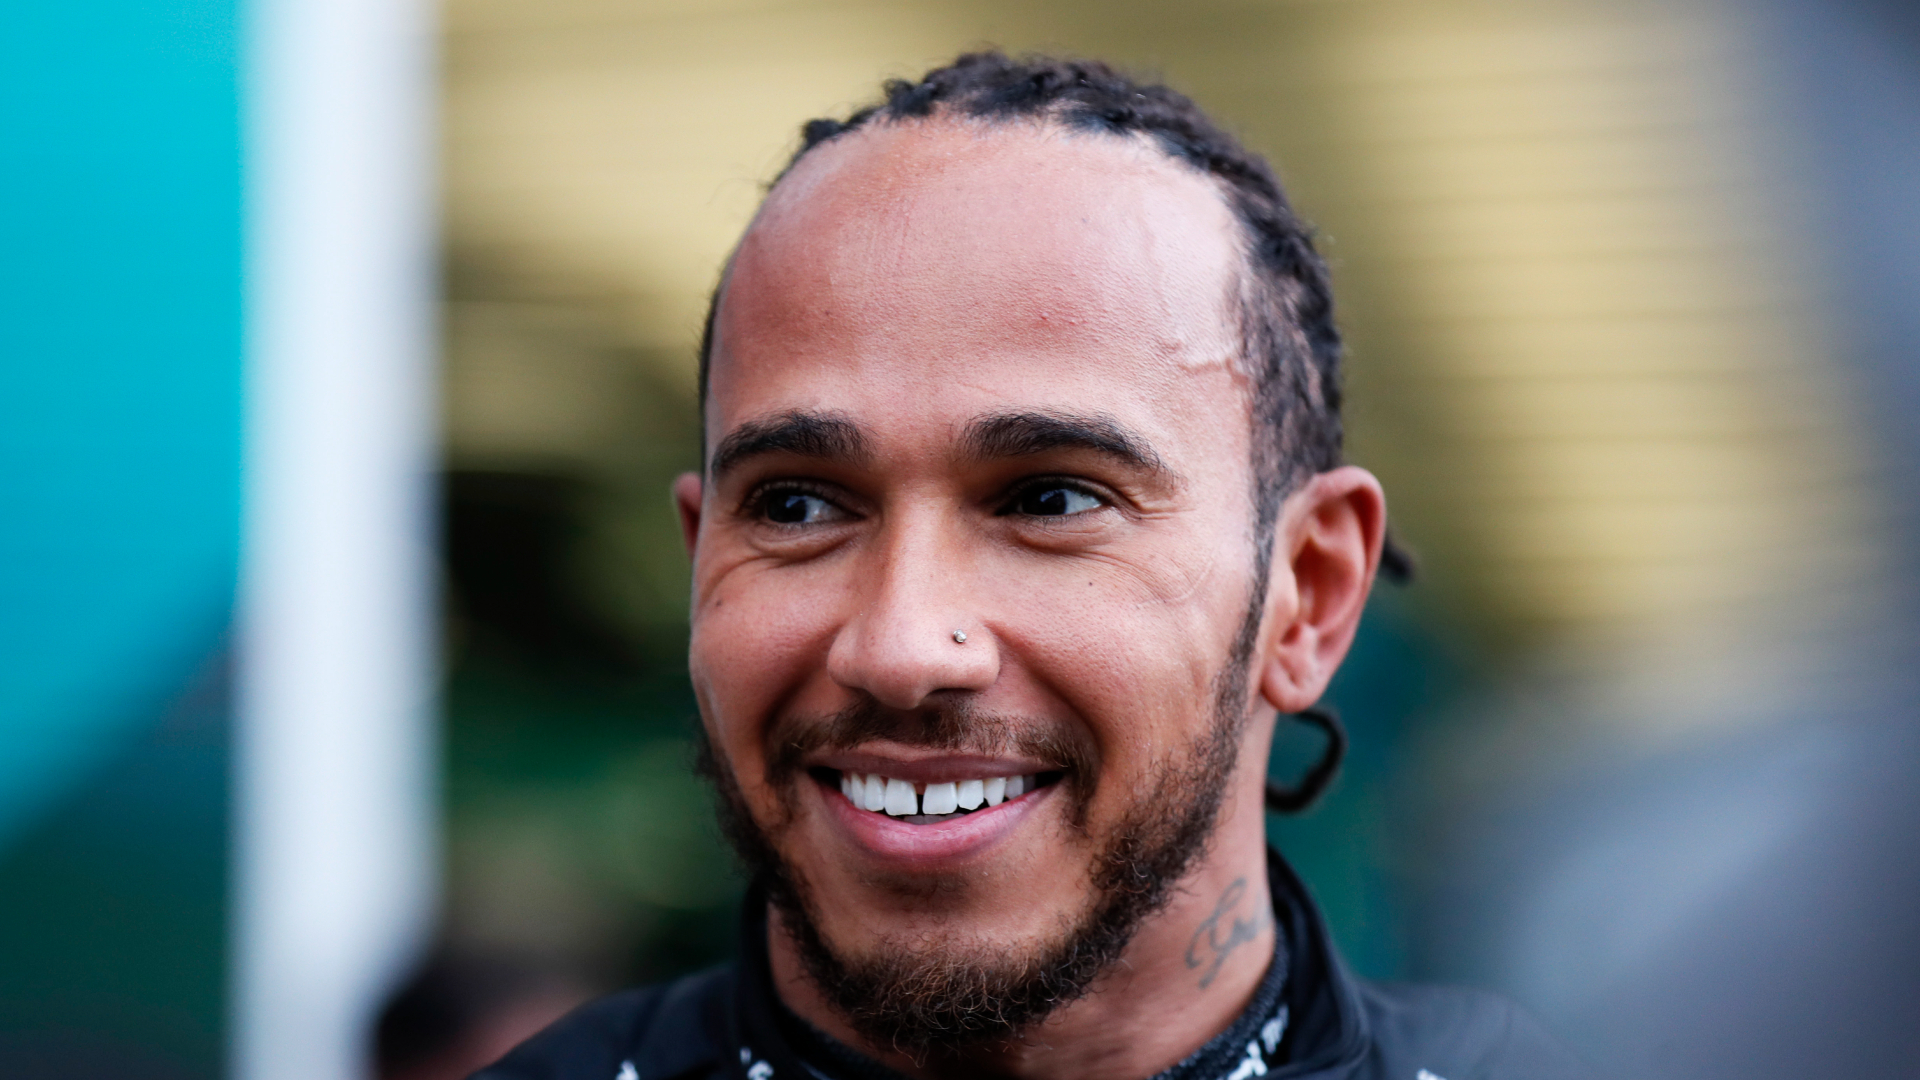 Lewis Hamilton gets 100th F1 win at Russian Grand Prix, takes season lead over Max Verstappen